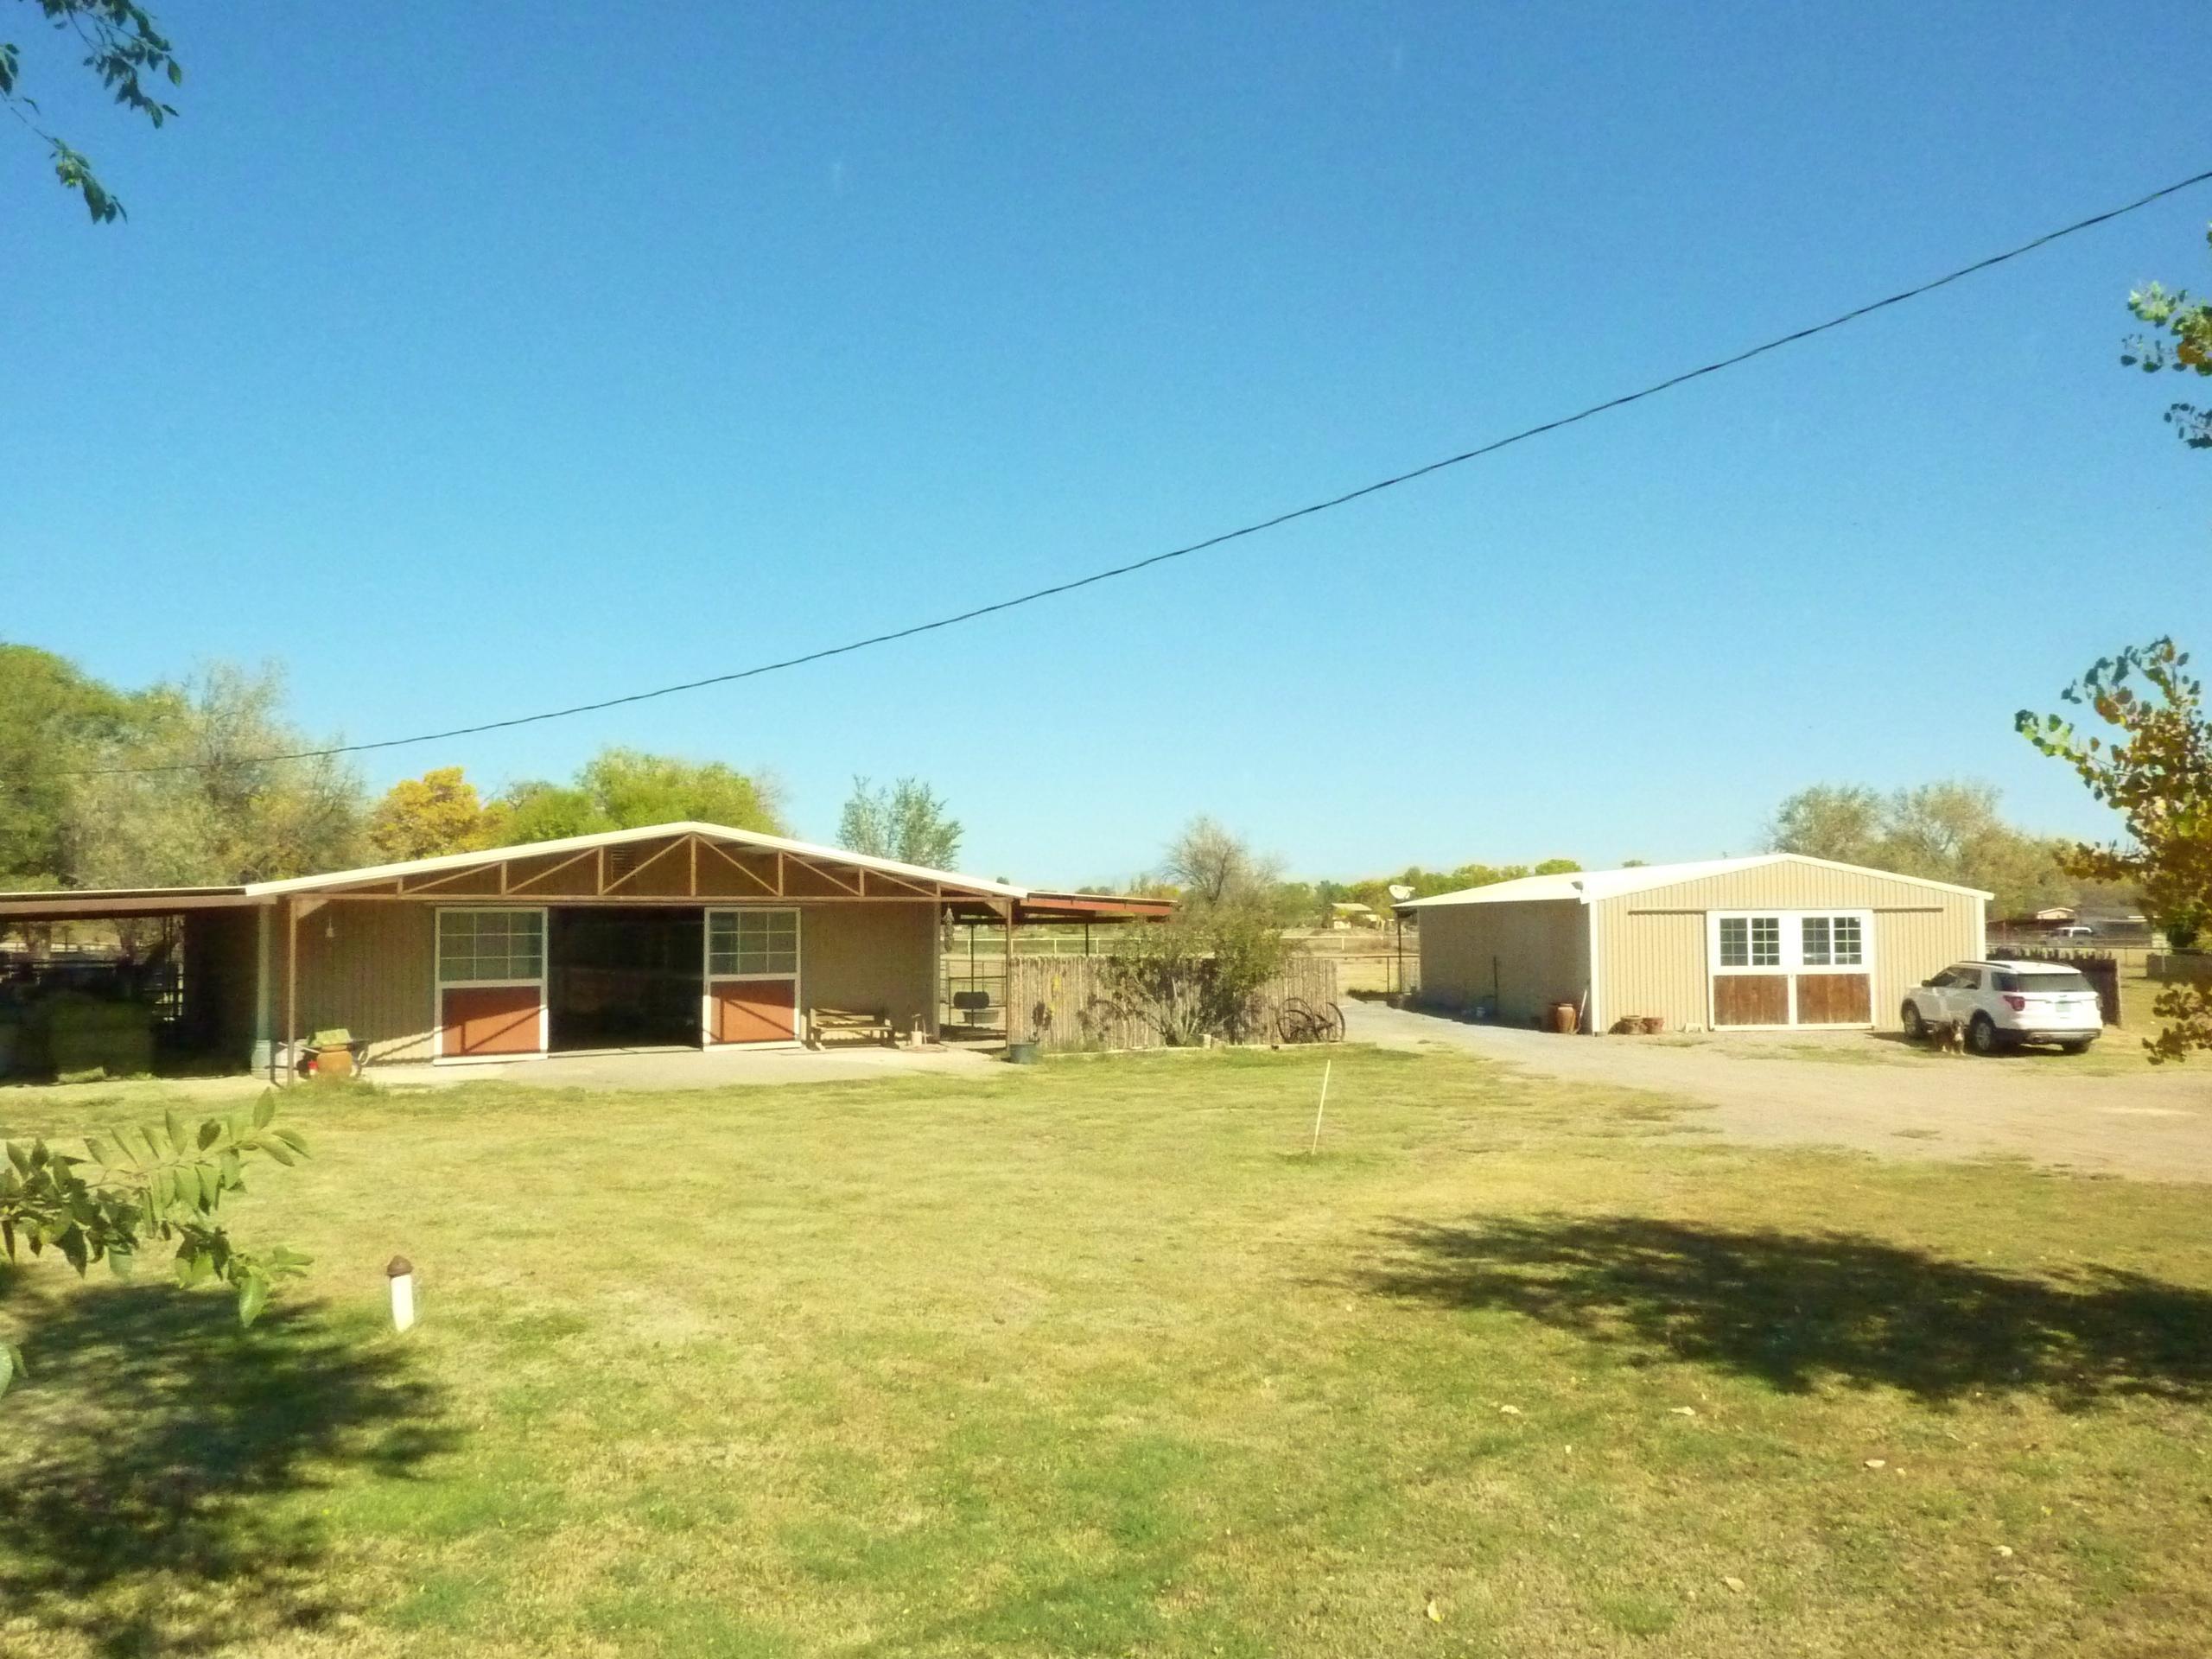 82 SUNFLOWER Lane Property Photo - Peralta, NM real estate listing